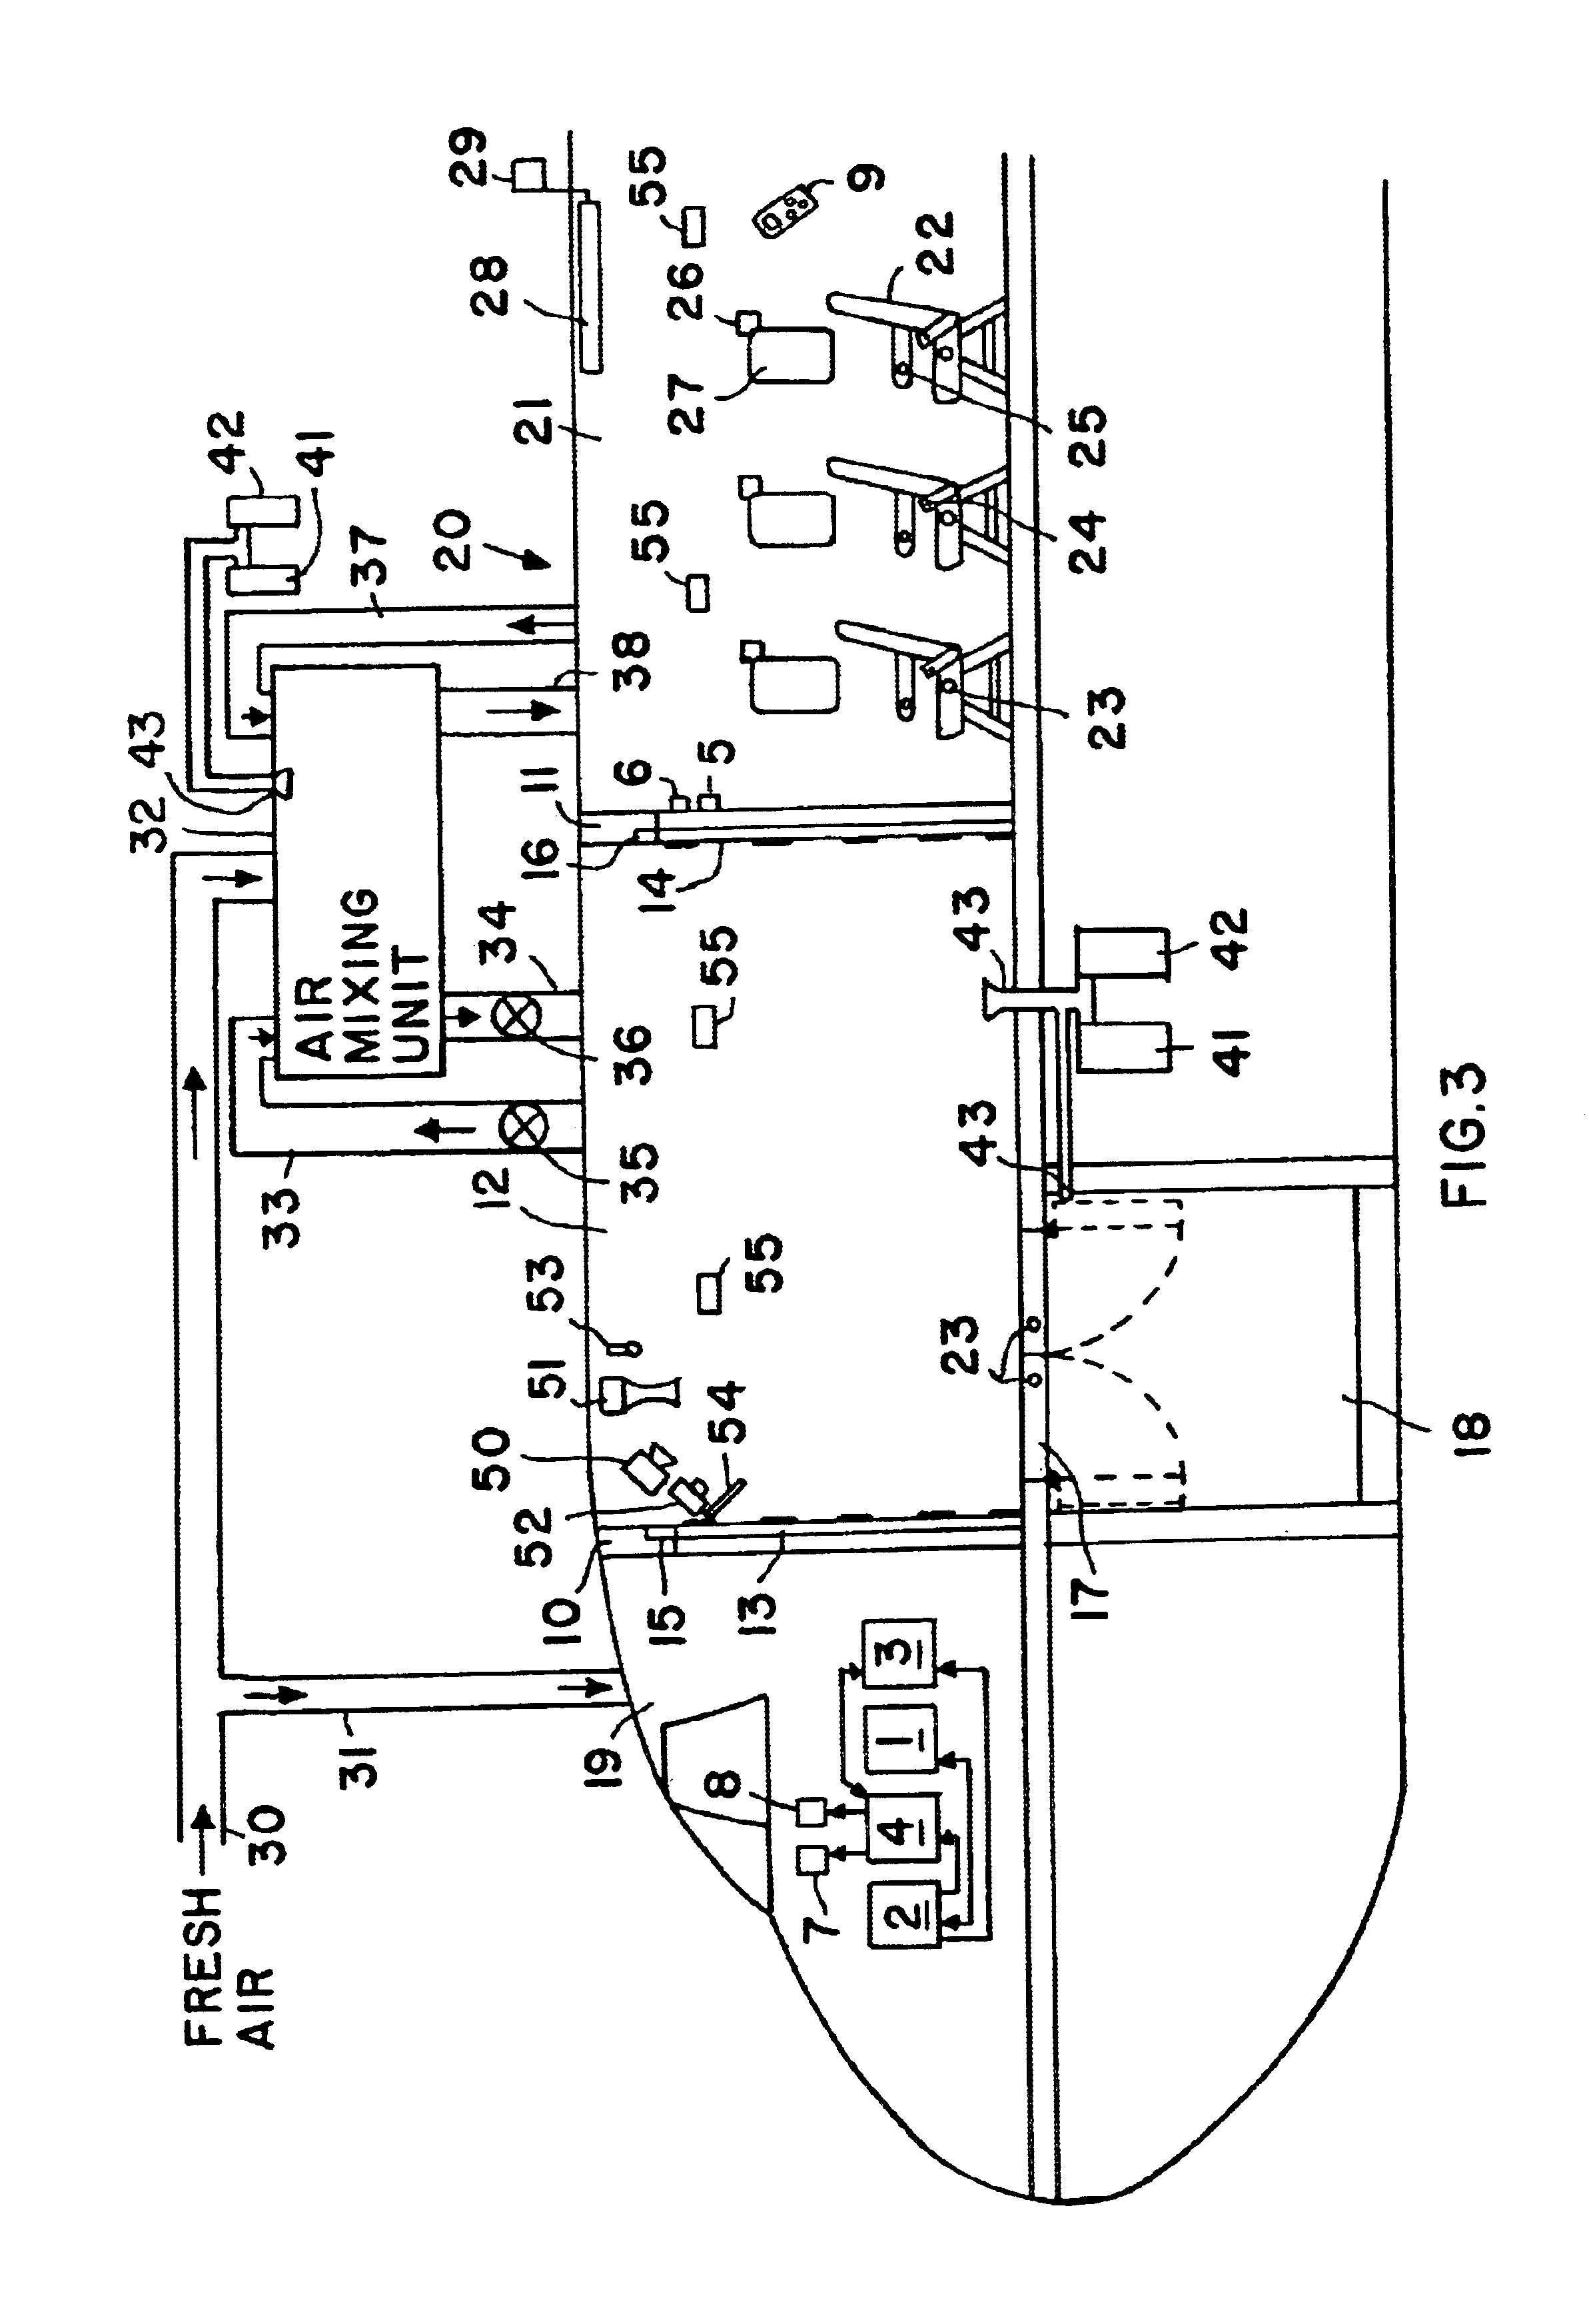 graystone intercom wiring diagram diagram picture of a